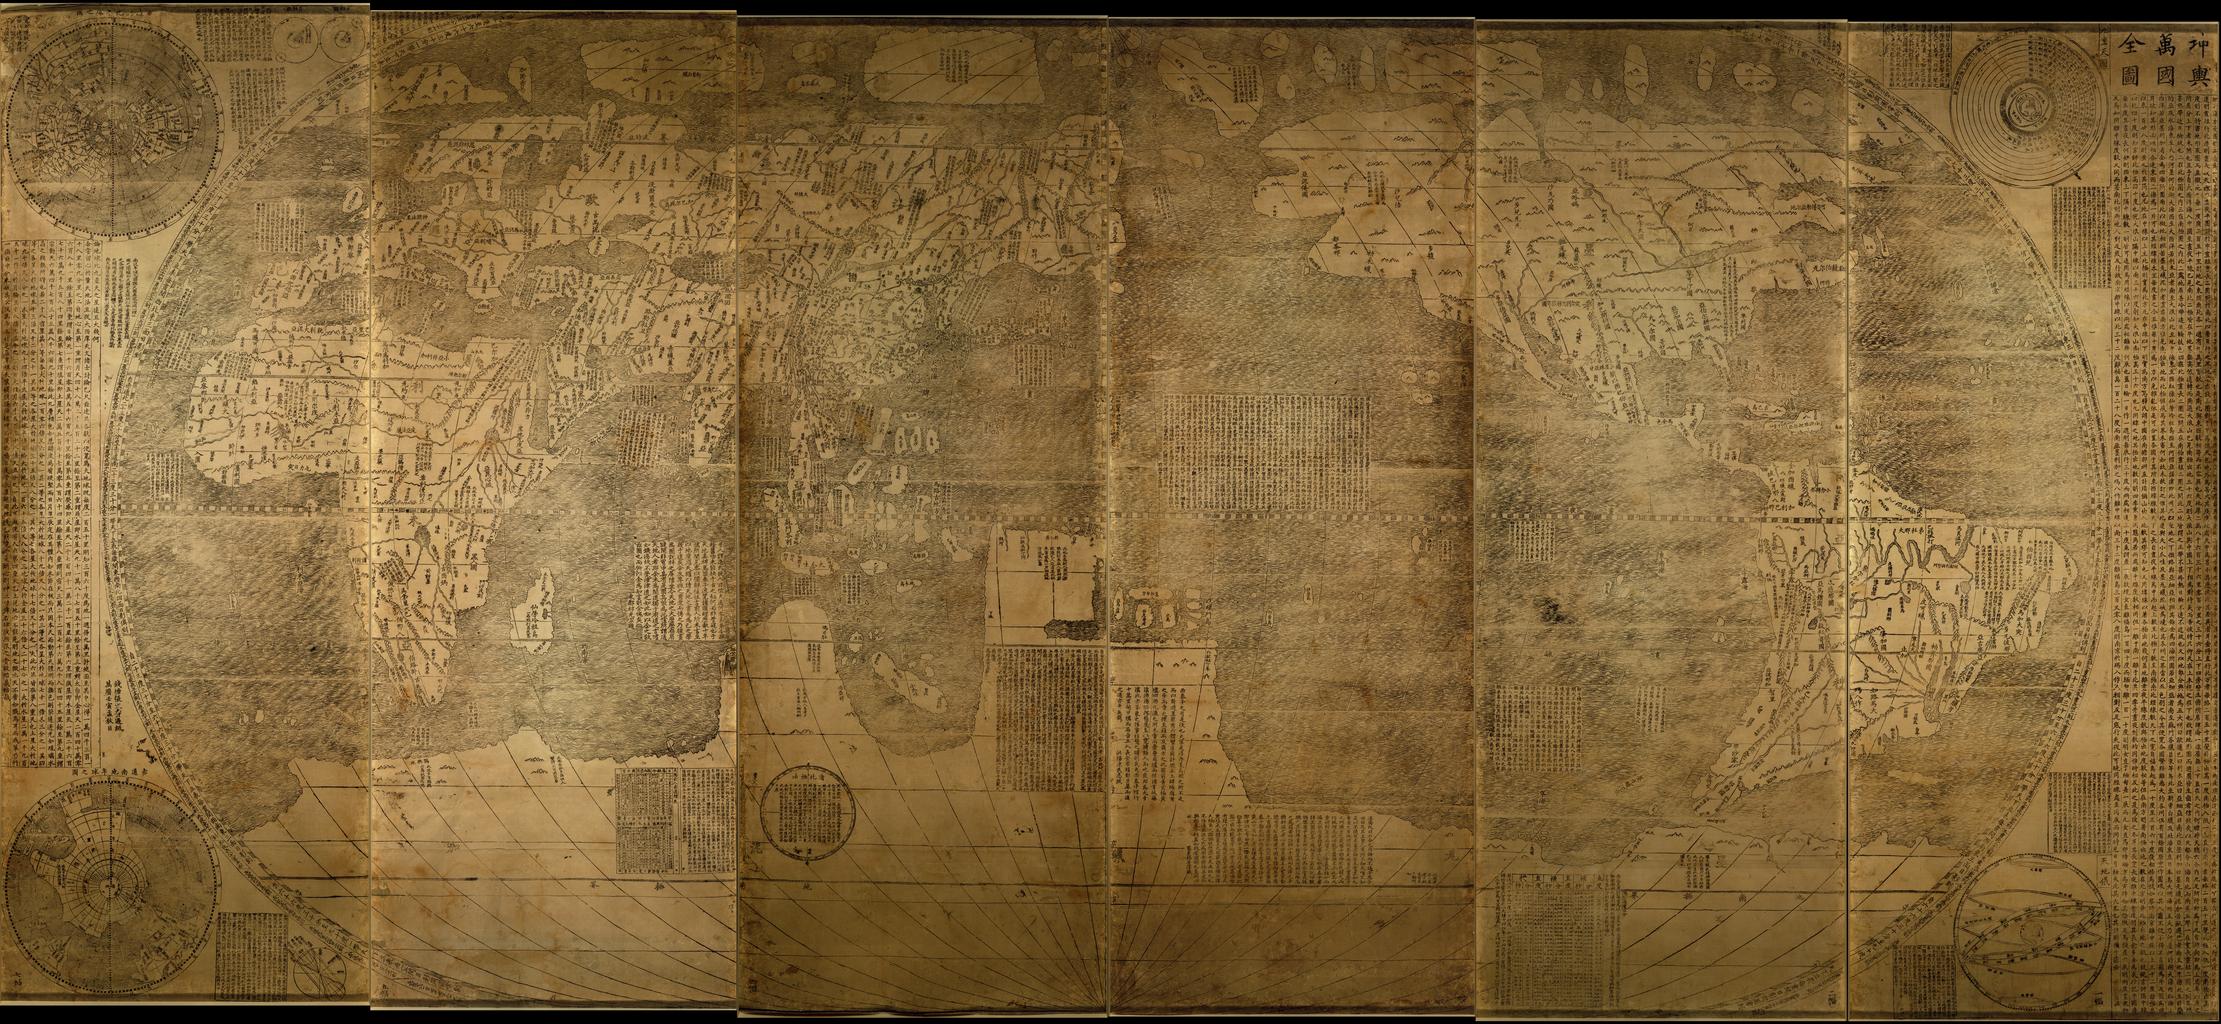 Ricci, Carte du monde, 1602